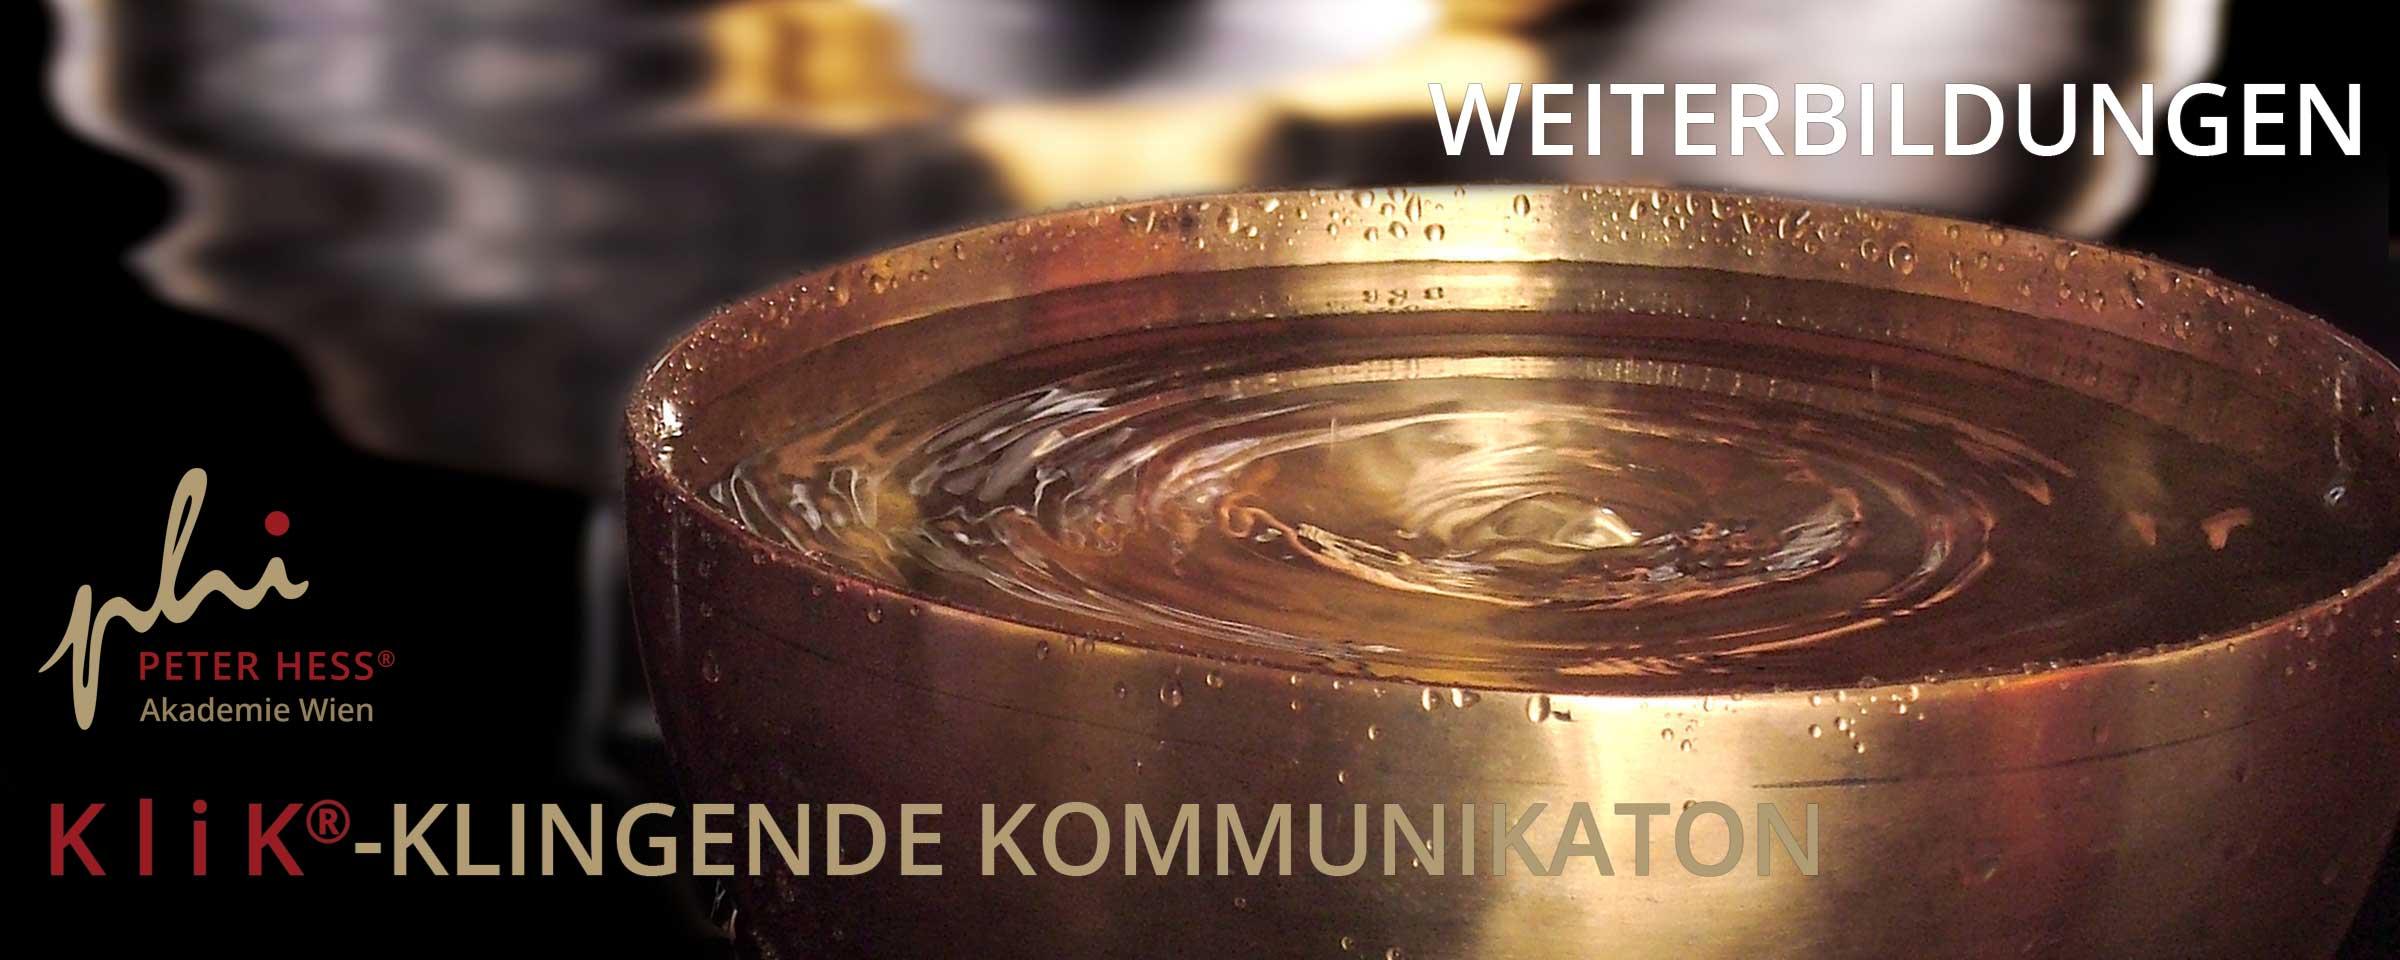 Peter Hess Akademie Wien